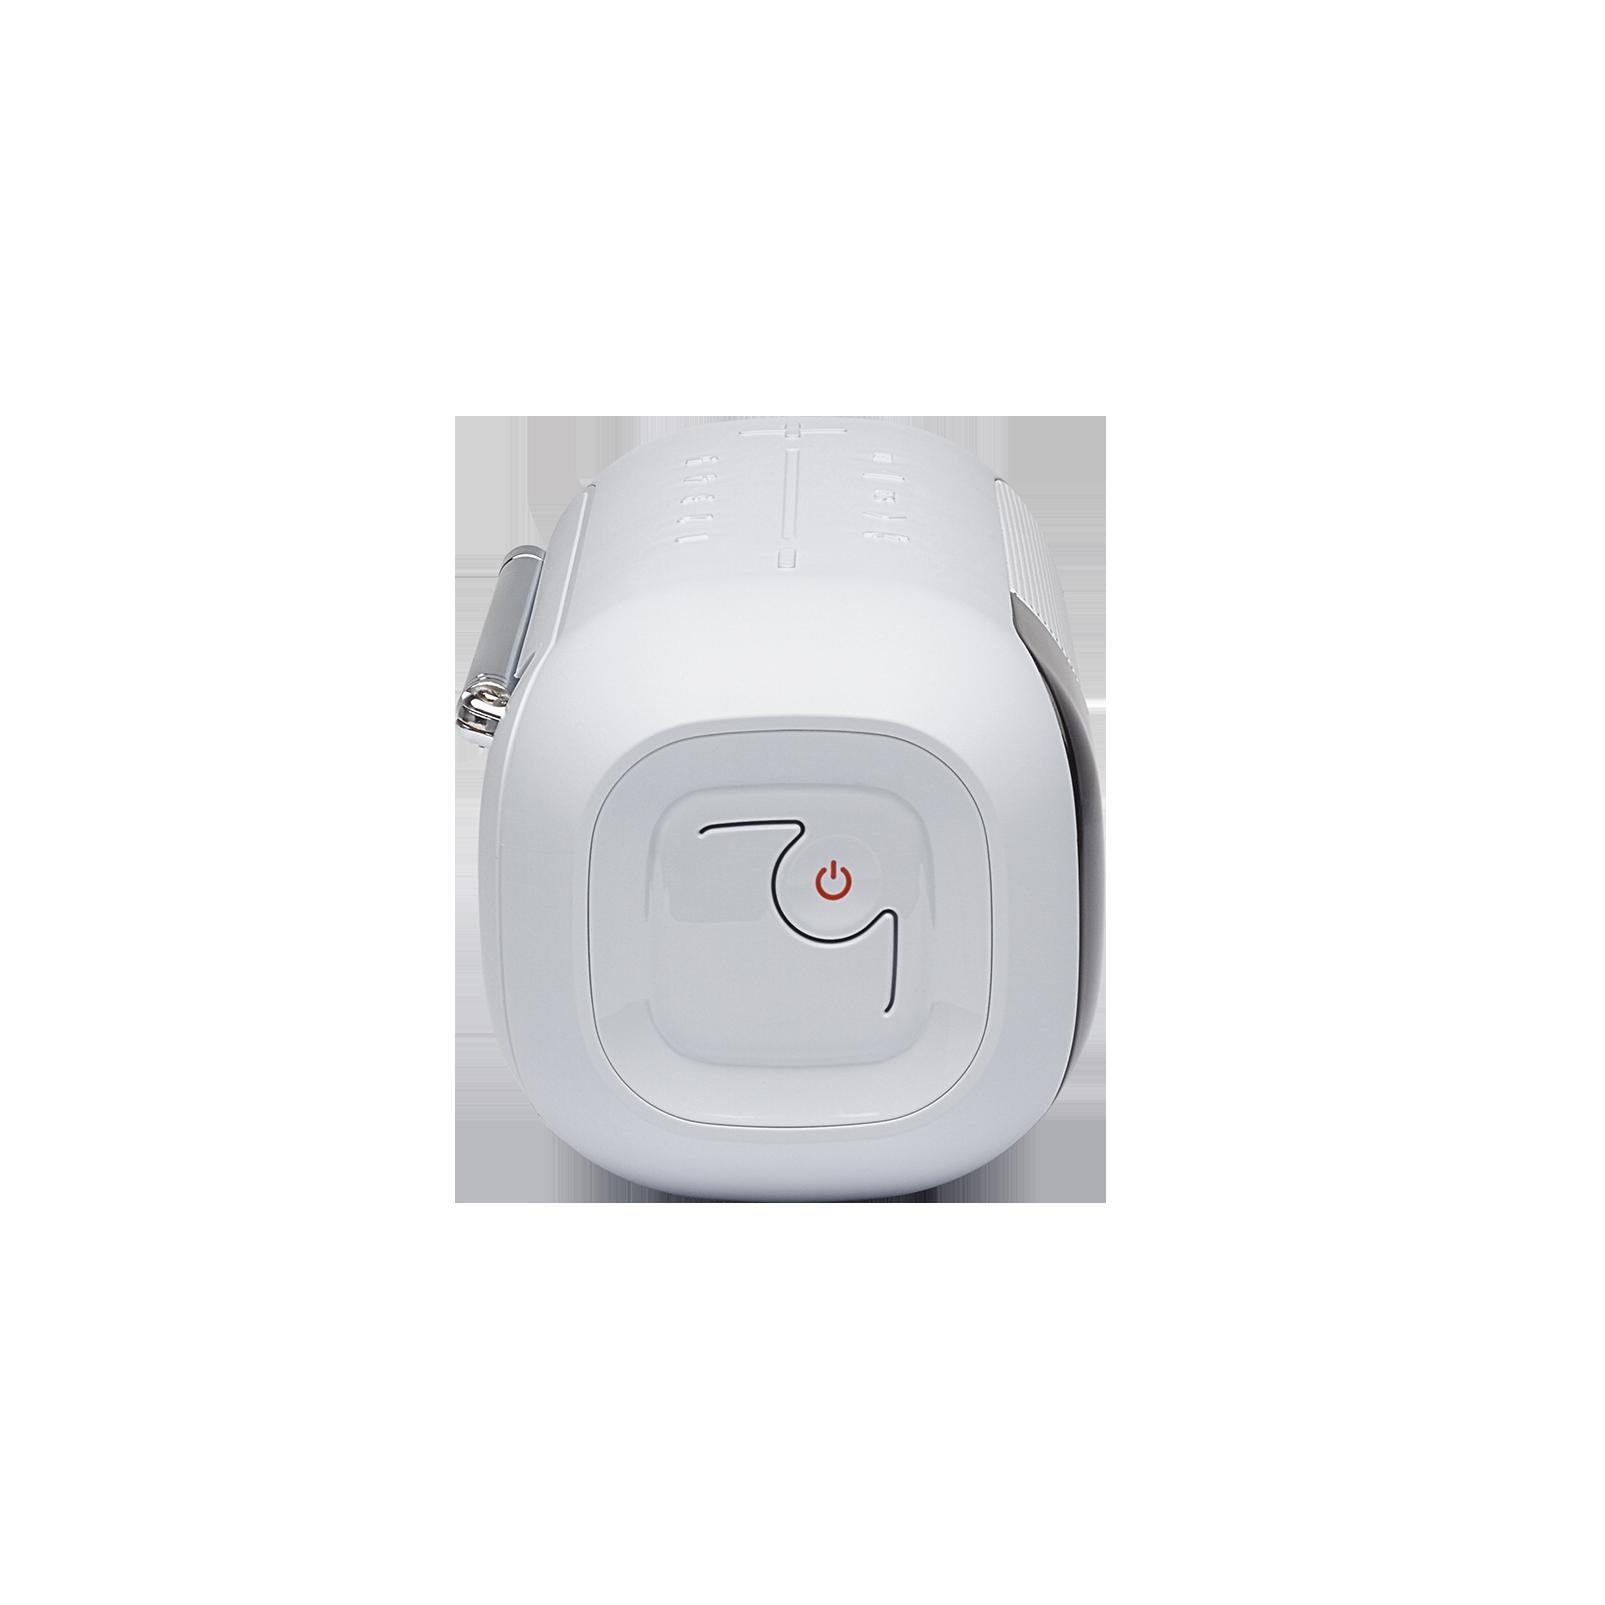 JBL Tuner 2 FM - White - Portable FM radio with Bluetooth - Detailshot 1